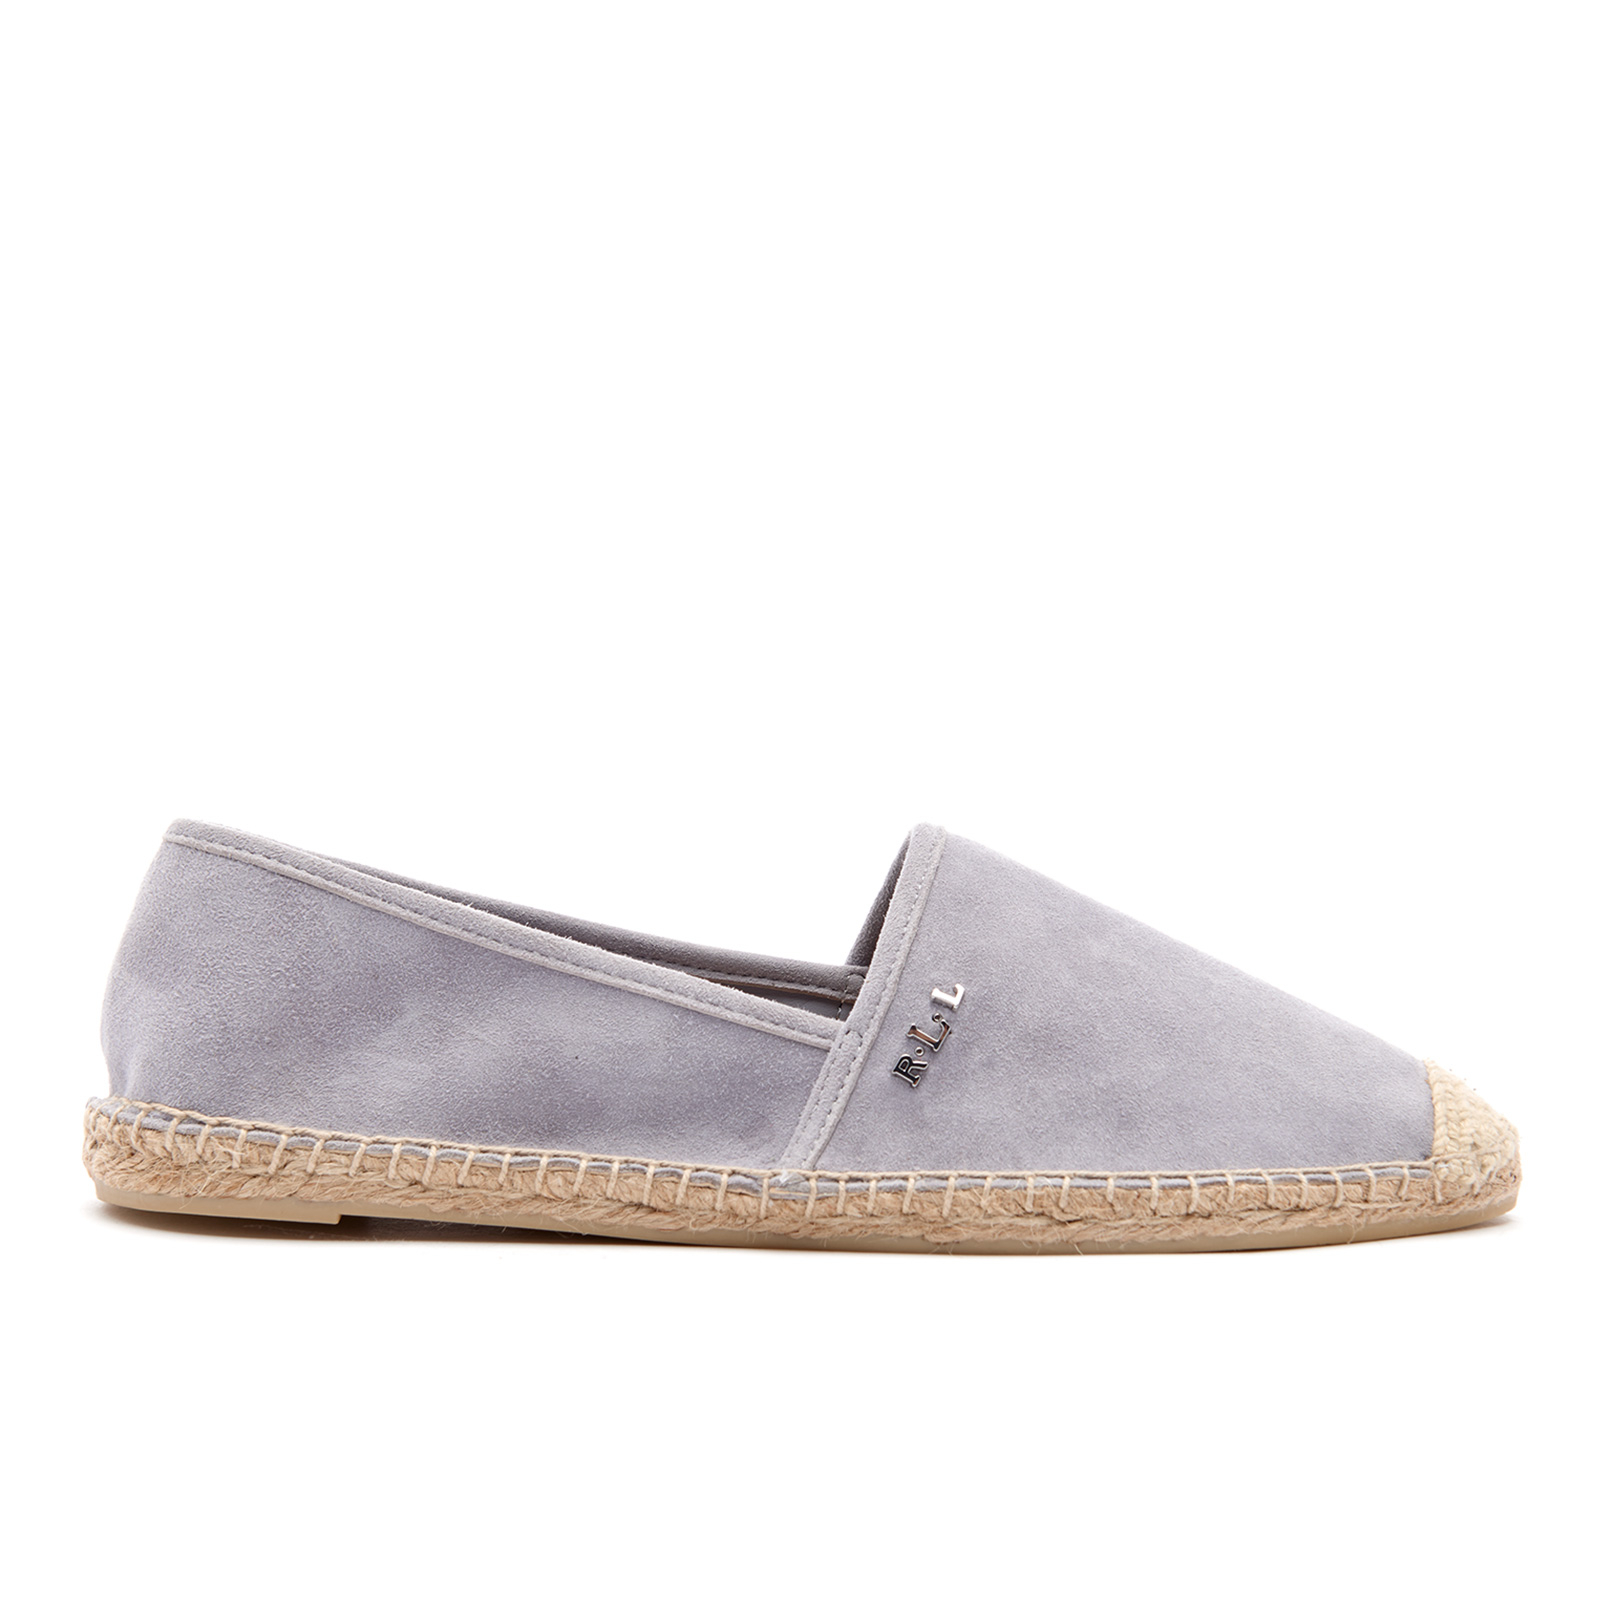 6e705d390247a Lauren Ralph Lauren Women's Danita Suede Flat Espadrilles - Chalk Grey